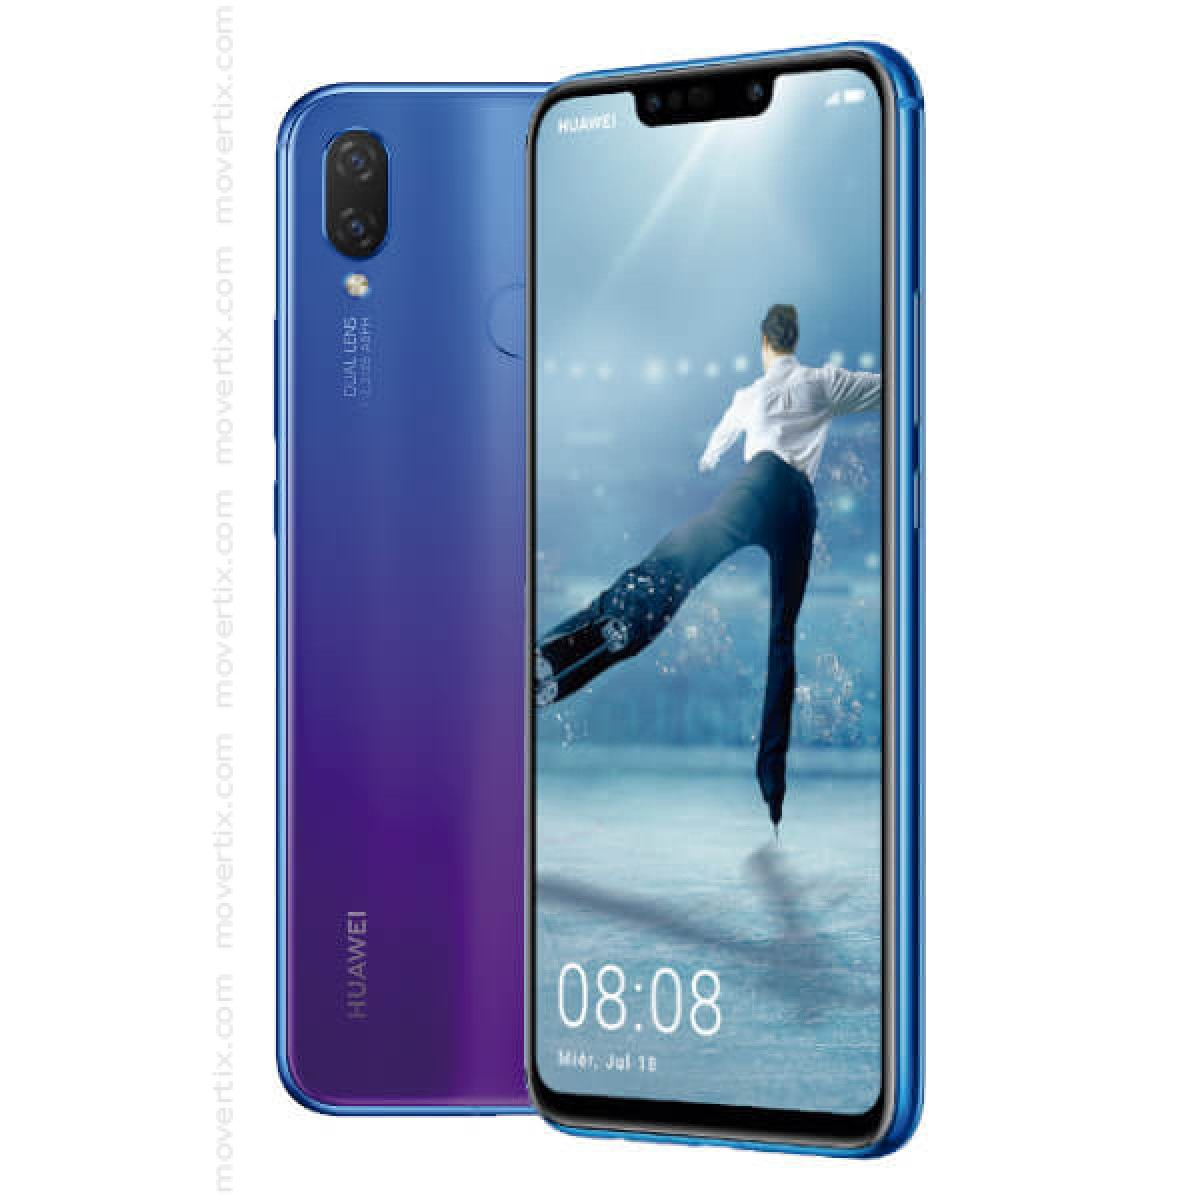 2f0c9d9c6ae Huawei P Smart Plus Dual SIM en Iris Purple de 64GB y 4GB RAM (INE-LX1)